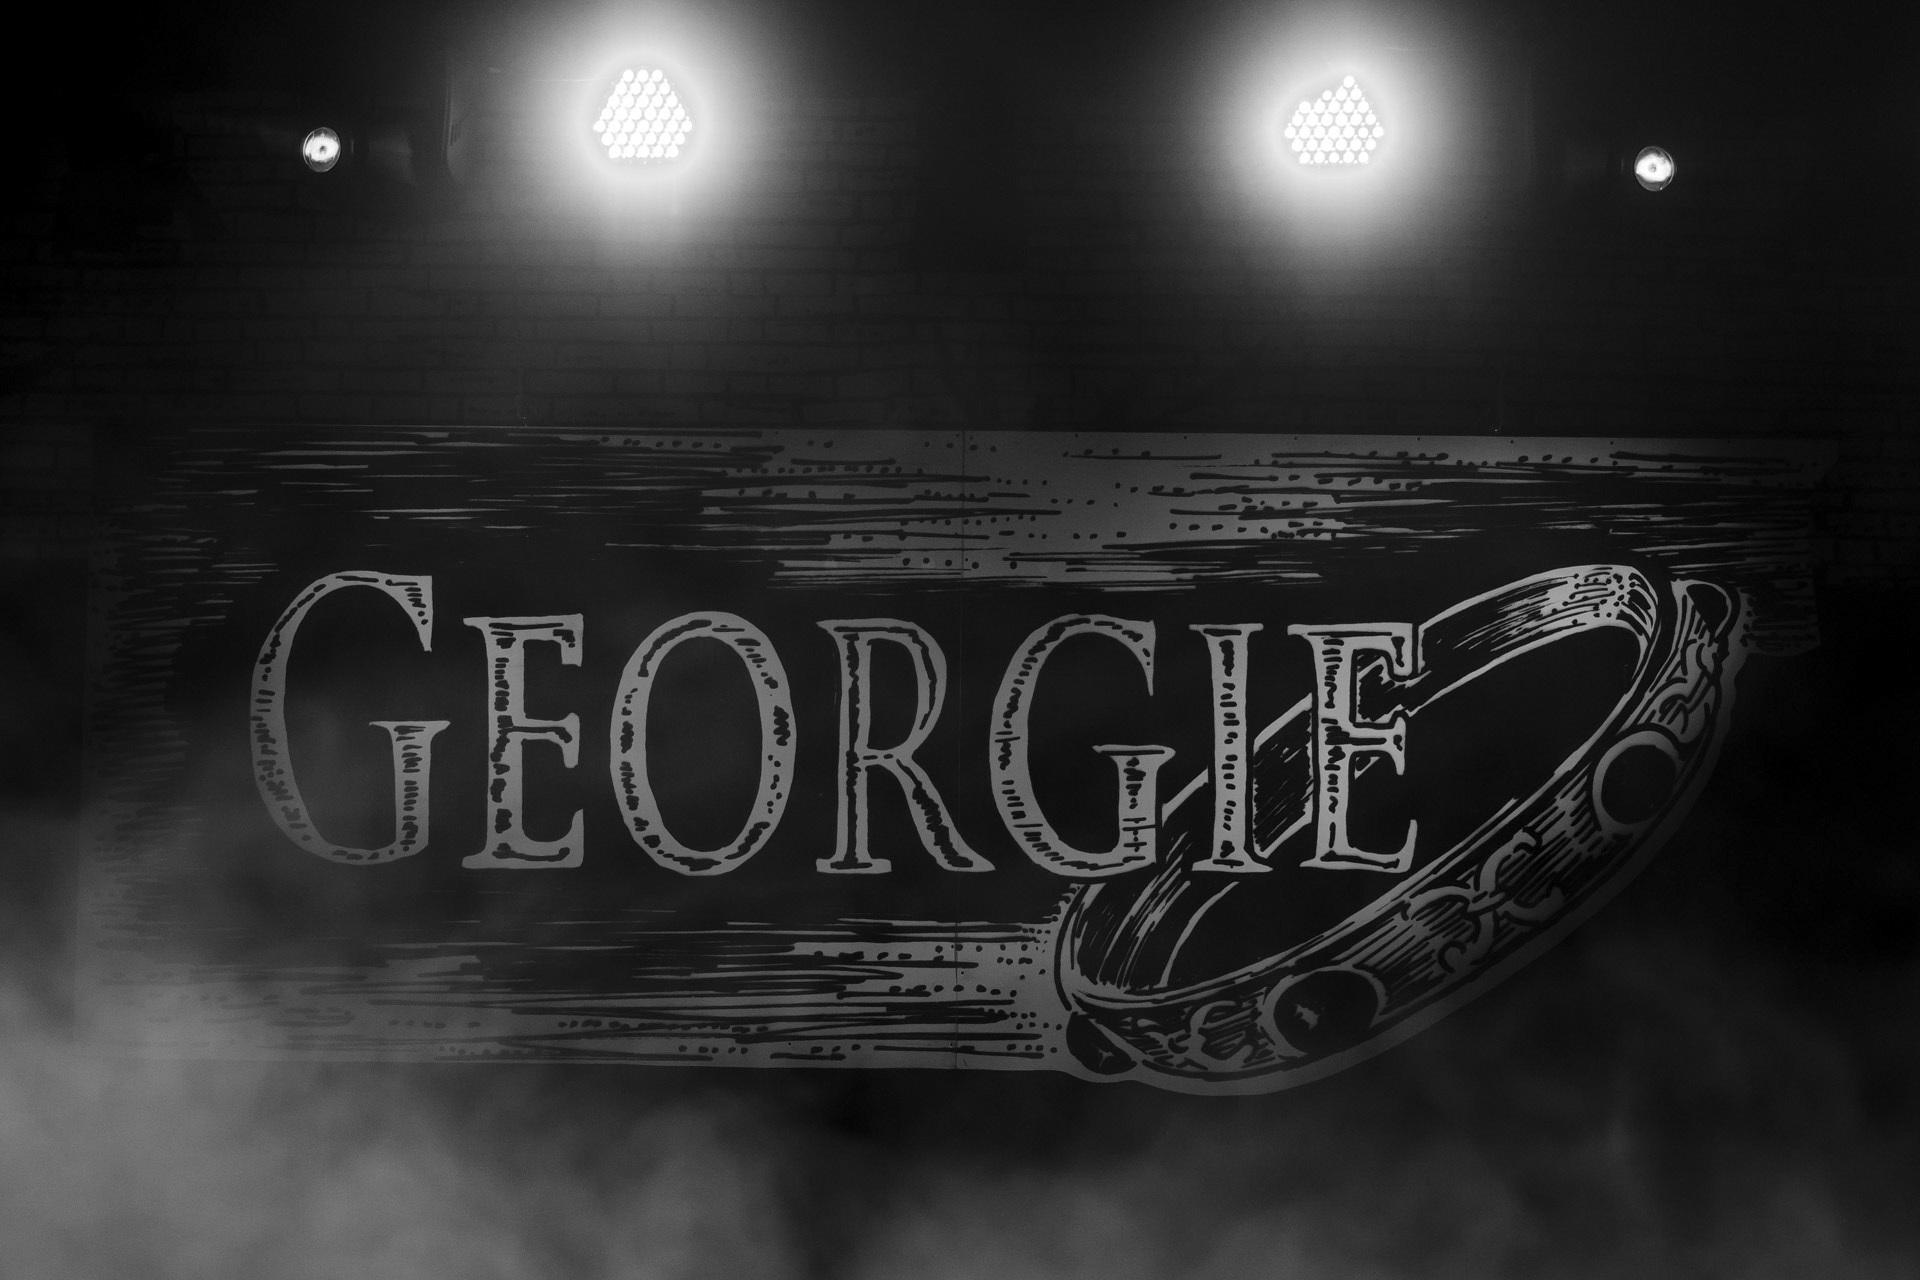 2017_04_09_Georgie_160944_5D4_6763